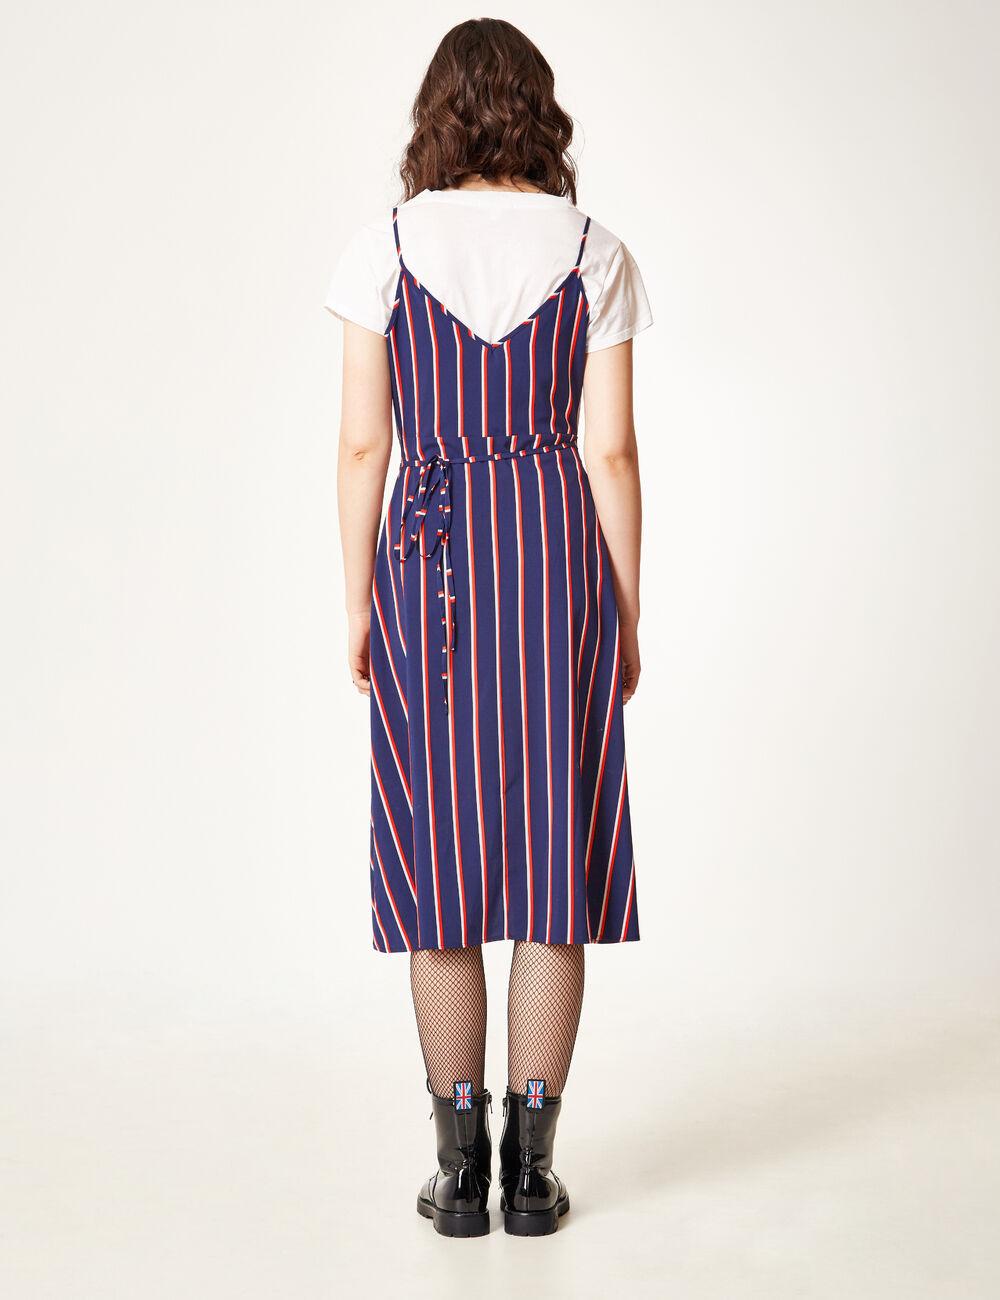 robe portefeuille ray e bleu marine rouge et blanche. Black Bedroom Furniture Sets. Home Design Ideas